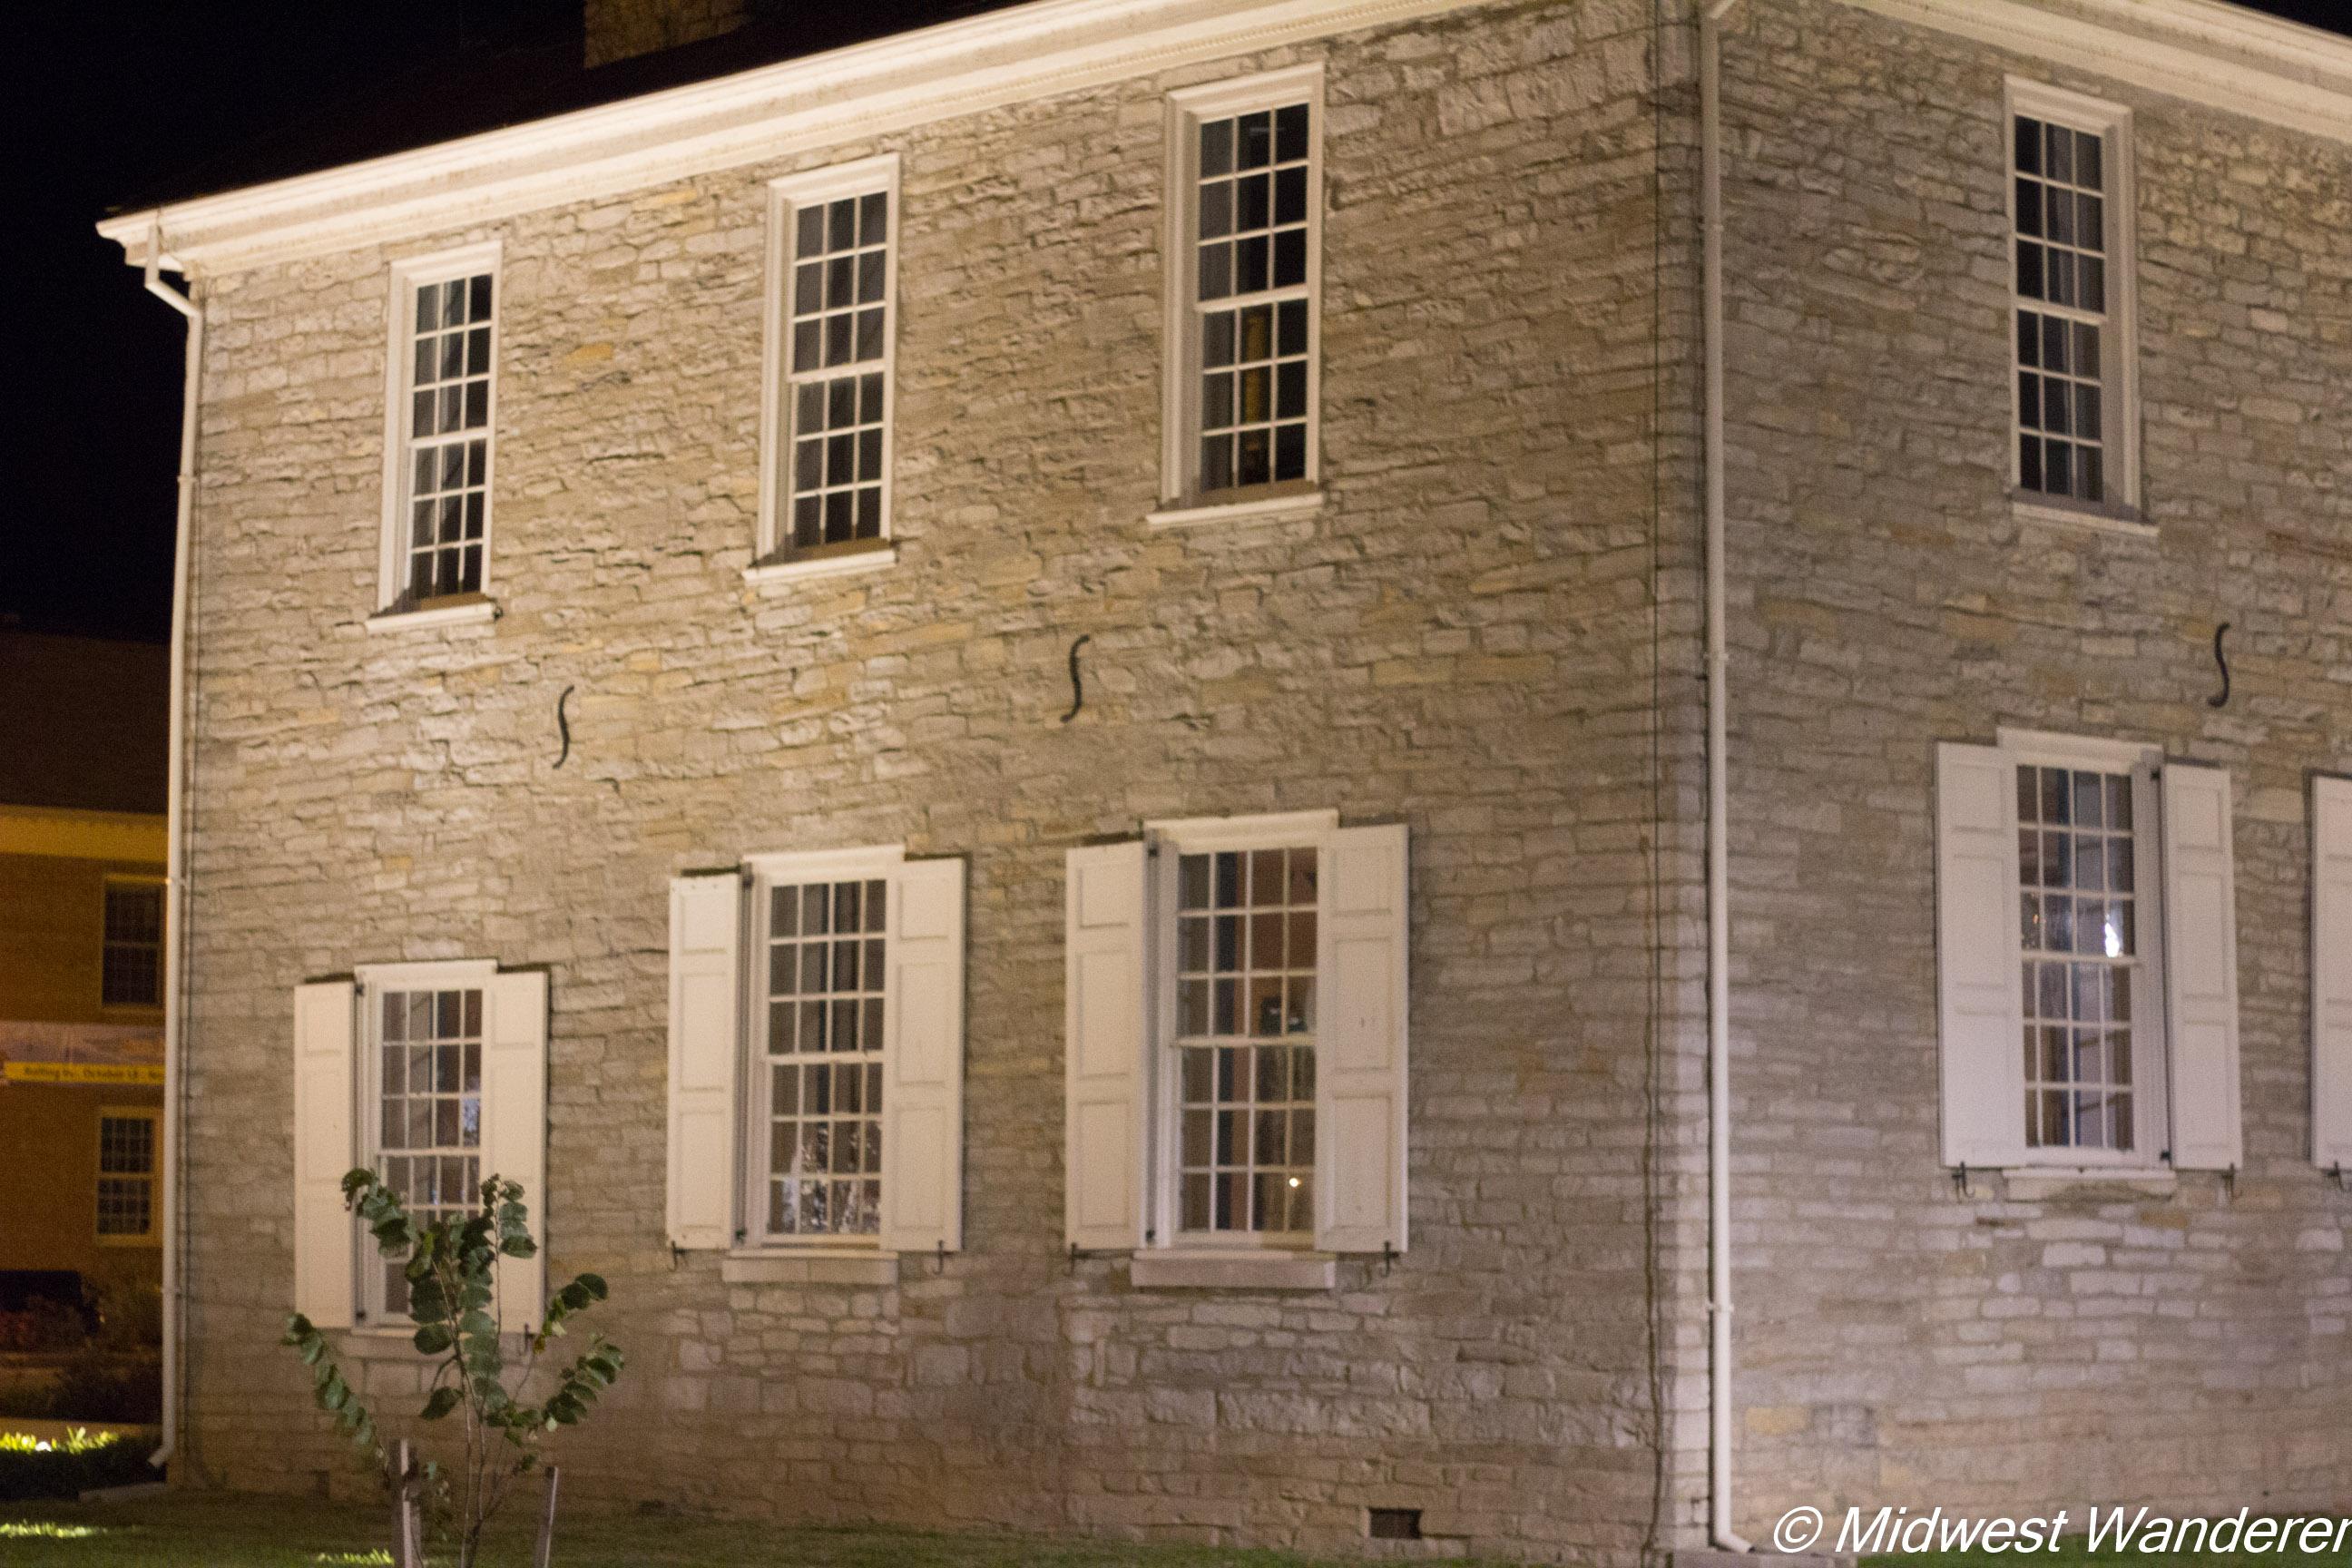 Corydon Capitol made of limestone